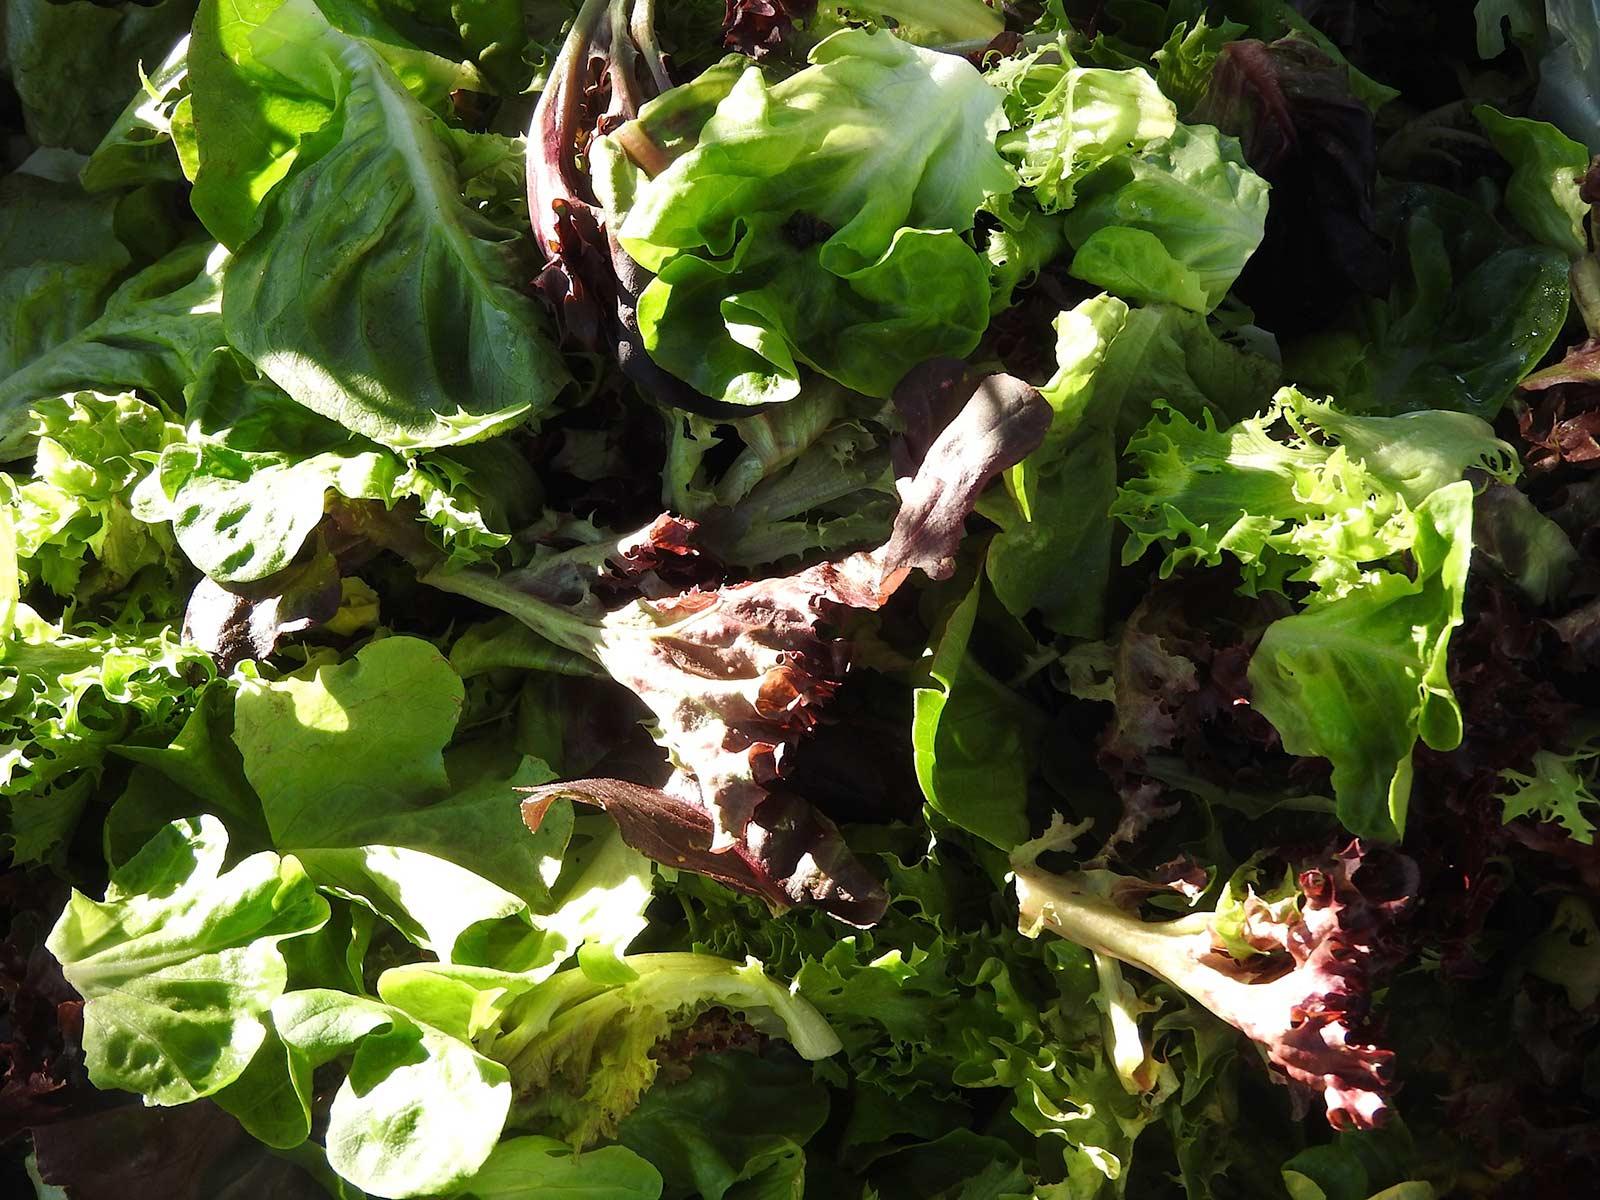 Santa Fe Farmers Market - Lettuce